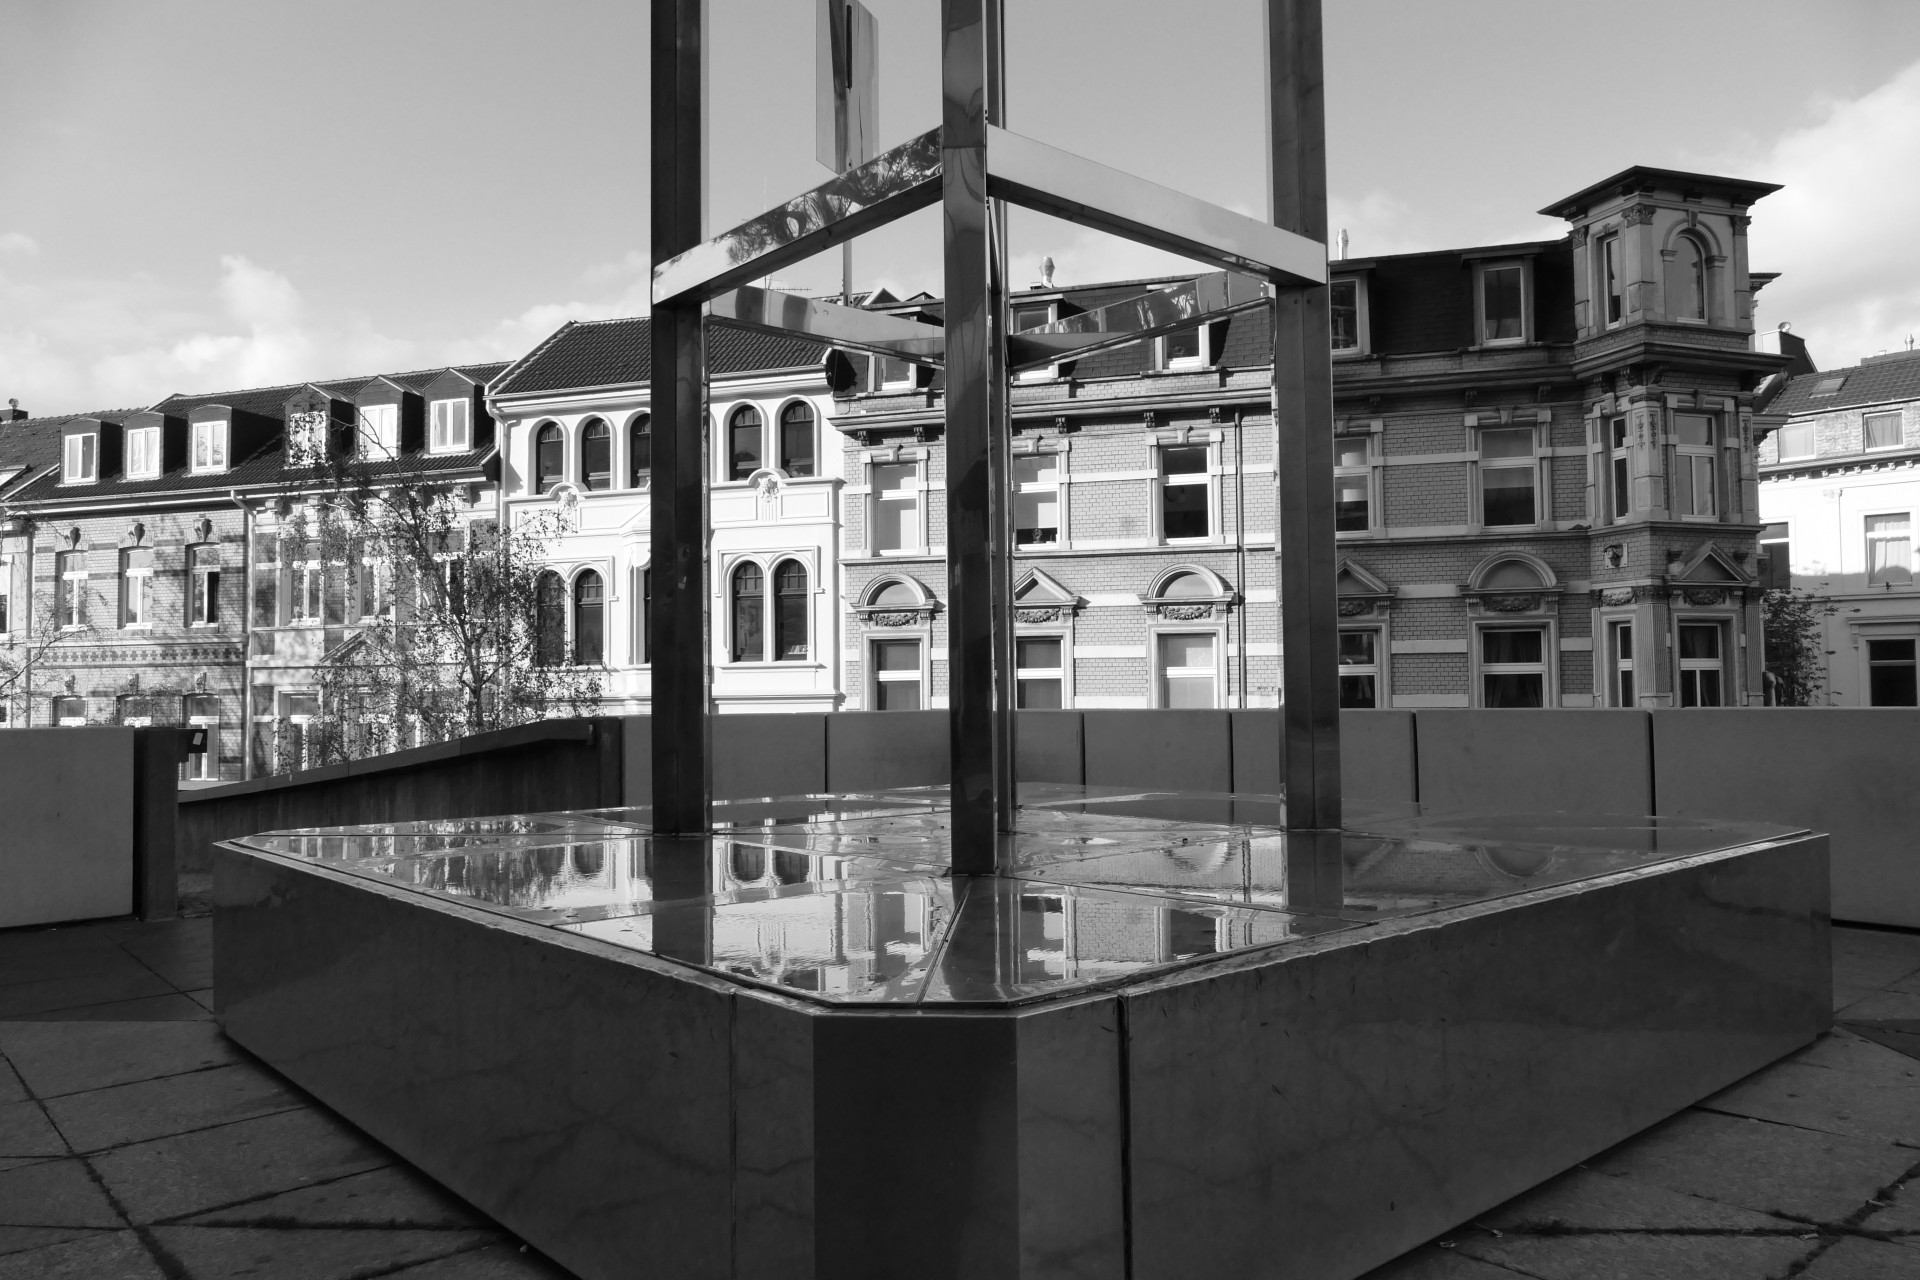 Ausblick Stadthaus auf Maxstrasse f/5.6 1/1300sec ISO-400 9.12mm